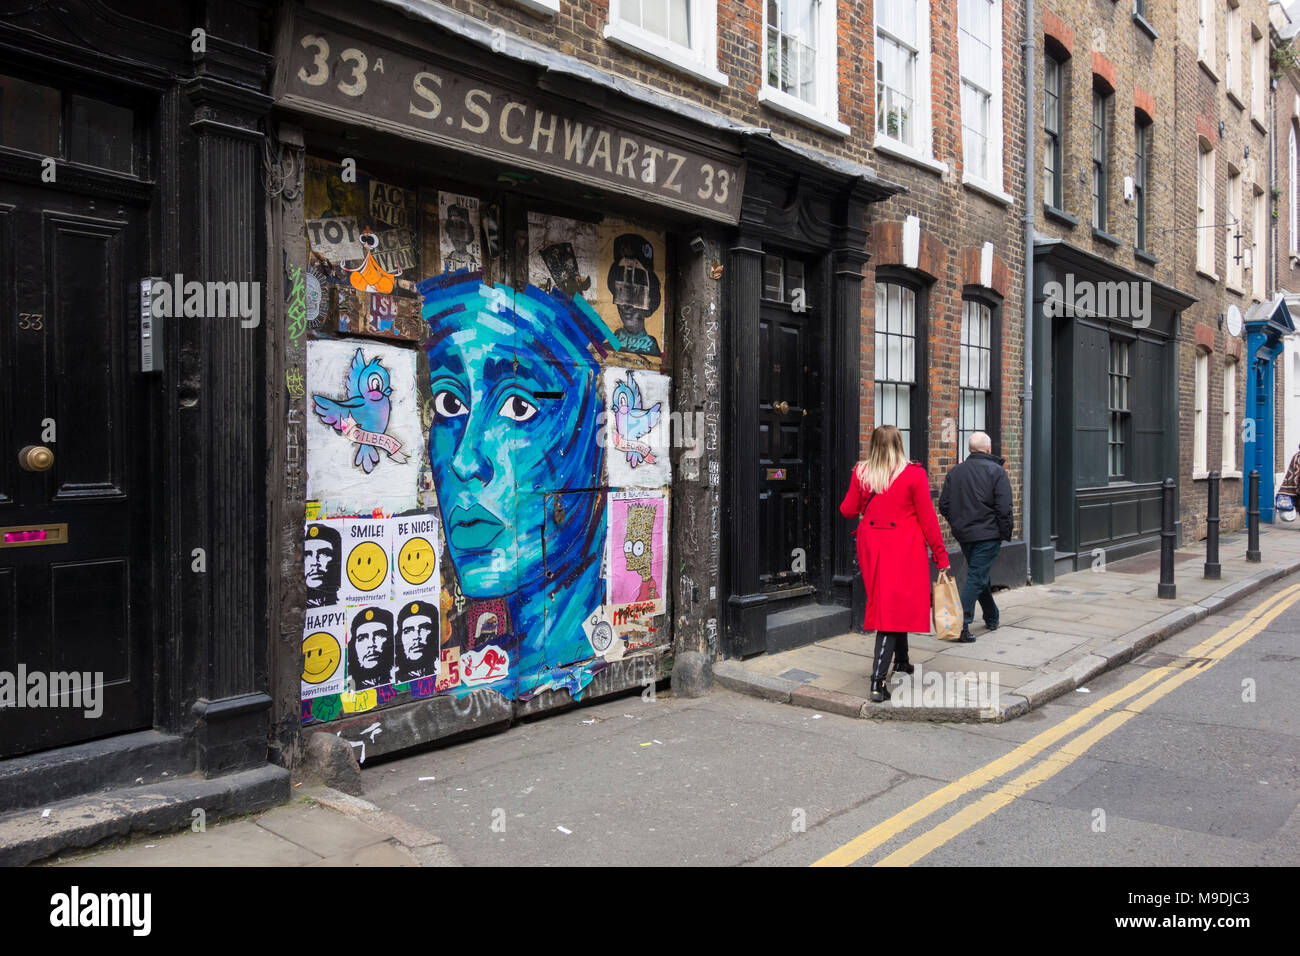 Street art on the gates to S. Schwartz at 33 Fournier Street, Spitalfields, London, E1, UK Stock Photo